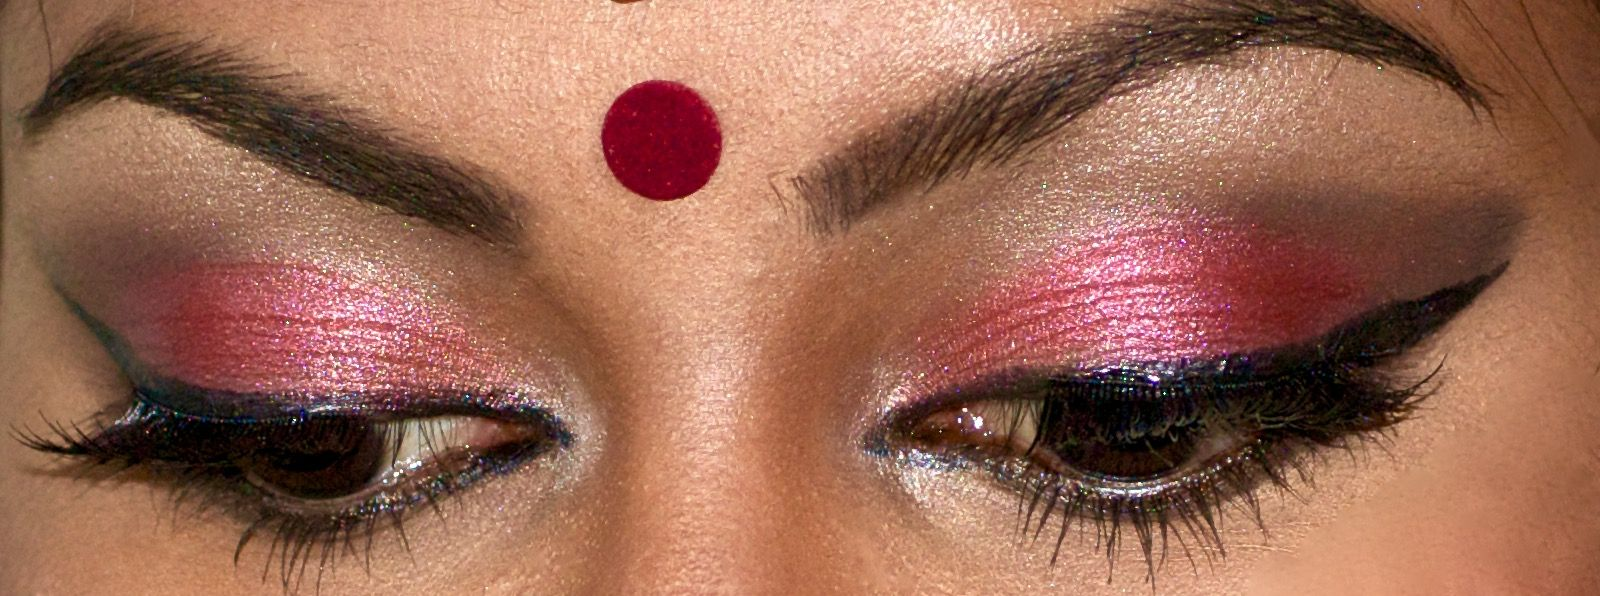 Eyes Eyeshadow Pottu Makeup Artist Hairstyle Artist Toronto Wedding Bridesmaids South Asian Makeup Eyeshadow Wedding Bridesmaids